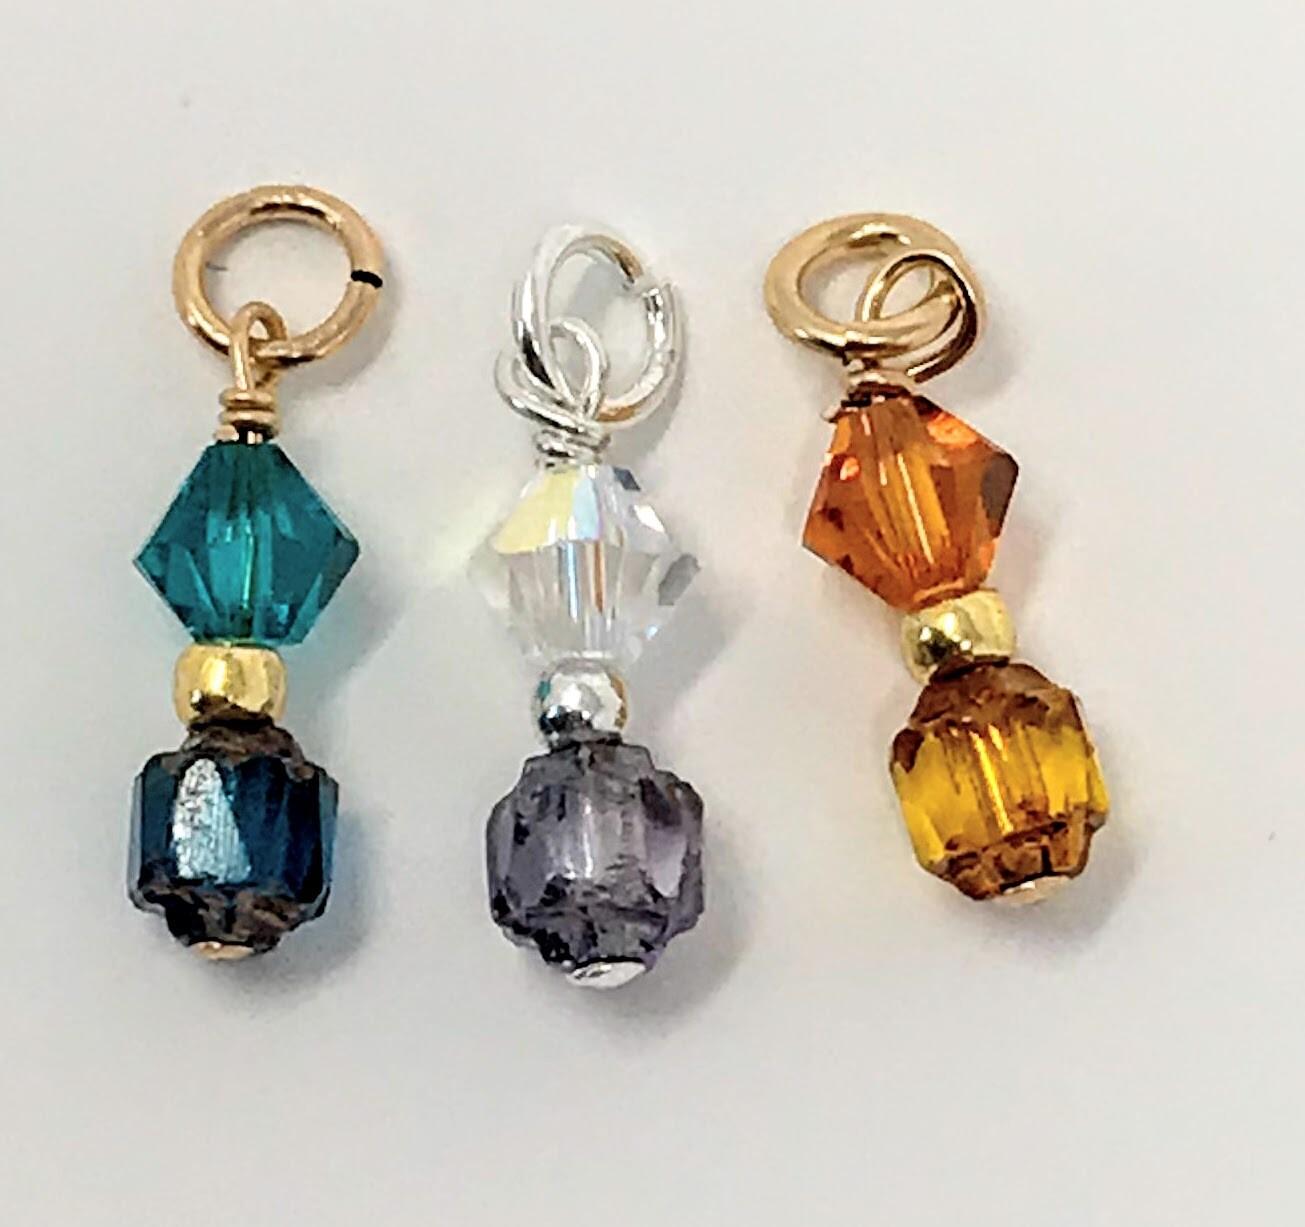 J-Crystal Bling (zicron, clear, hyacinth)